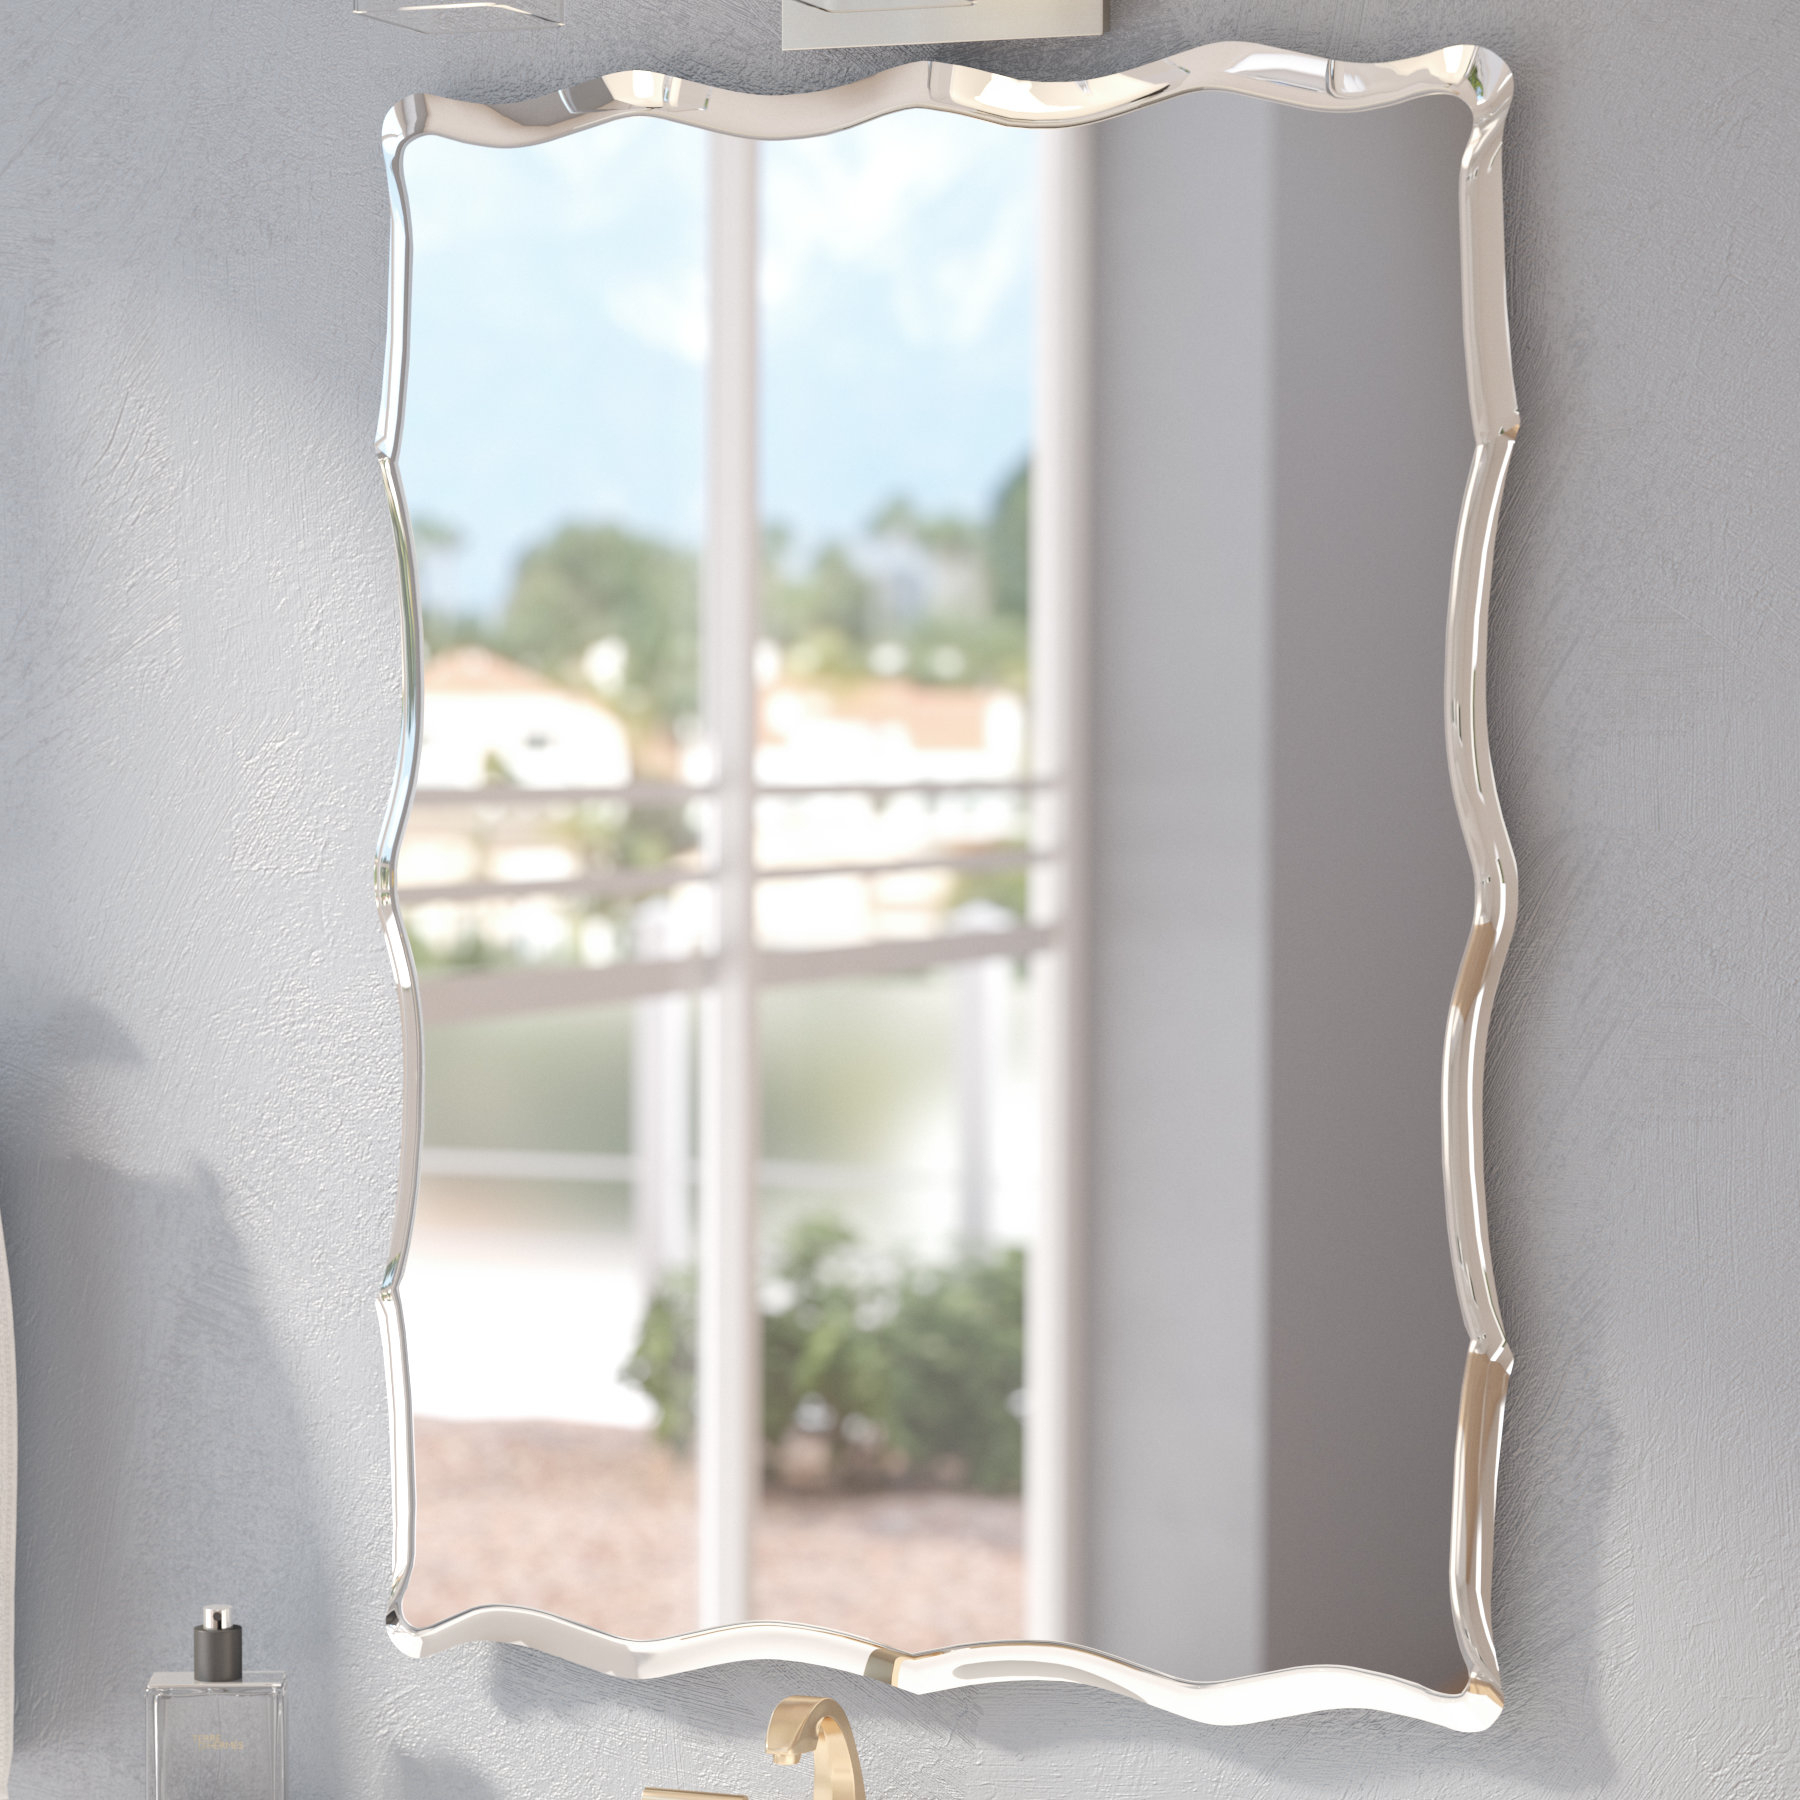 Estefania Frameless Wall Mirror Inside Logan Frameless Wall Mirrors (Image 4 of 20)